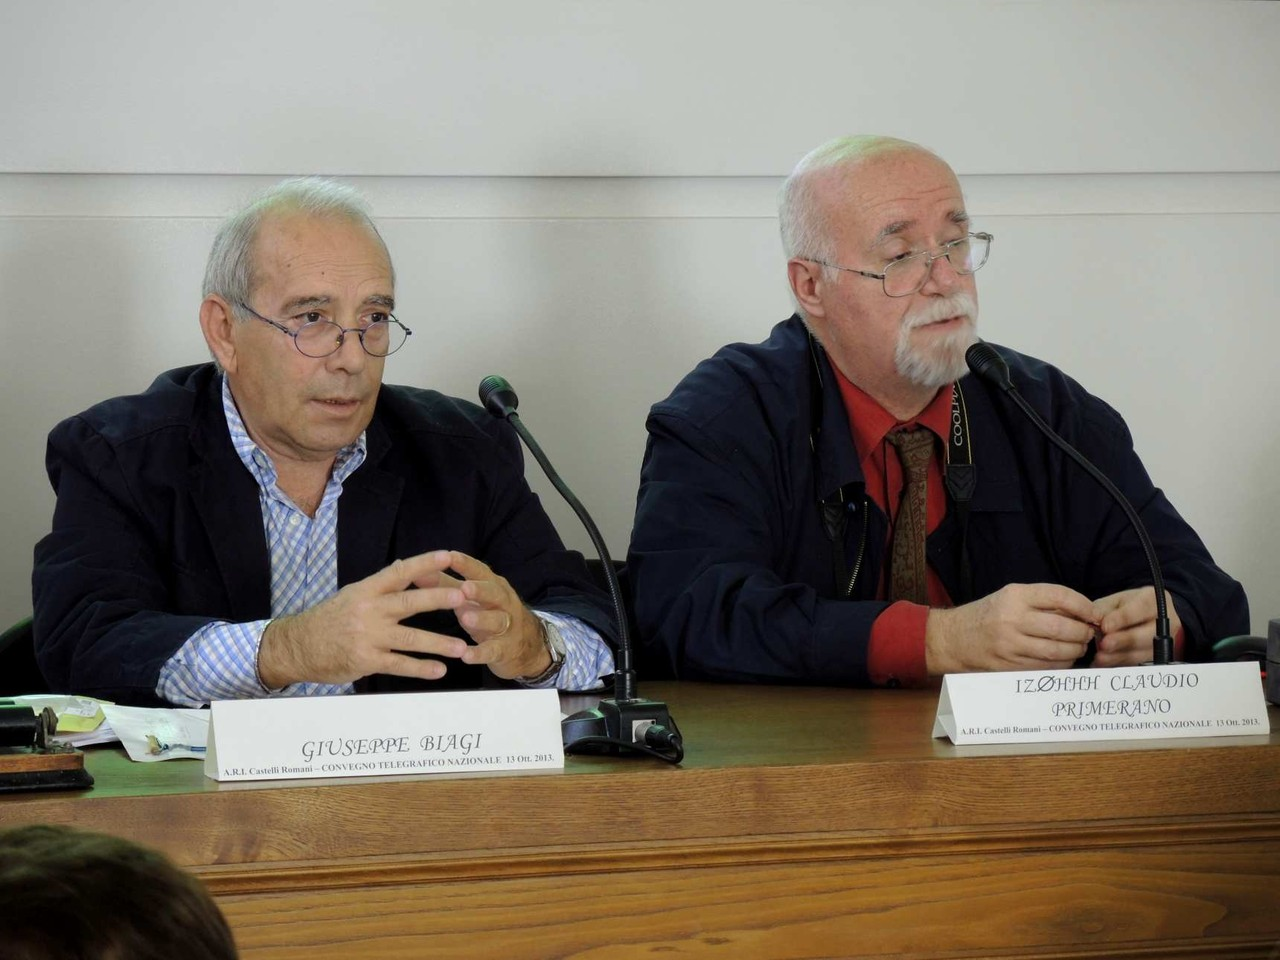 Giuseppe Biagi e Claudio IZ0HHH nell'intervento sull'Ondina e la Tenda Rossa